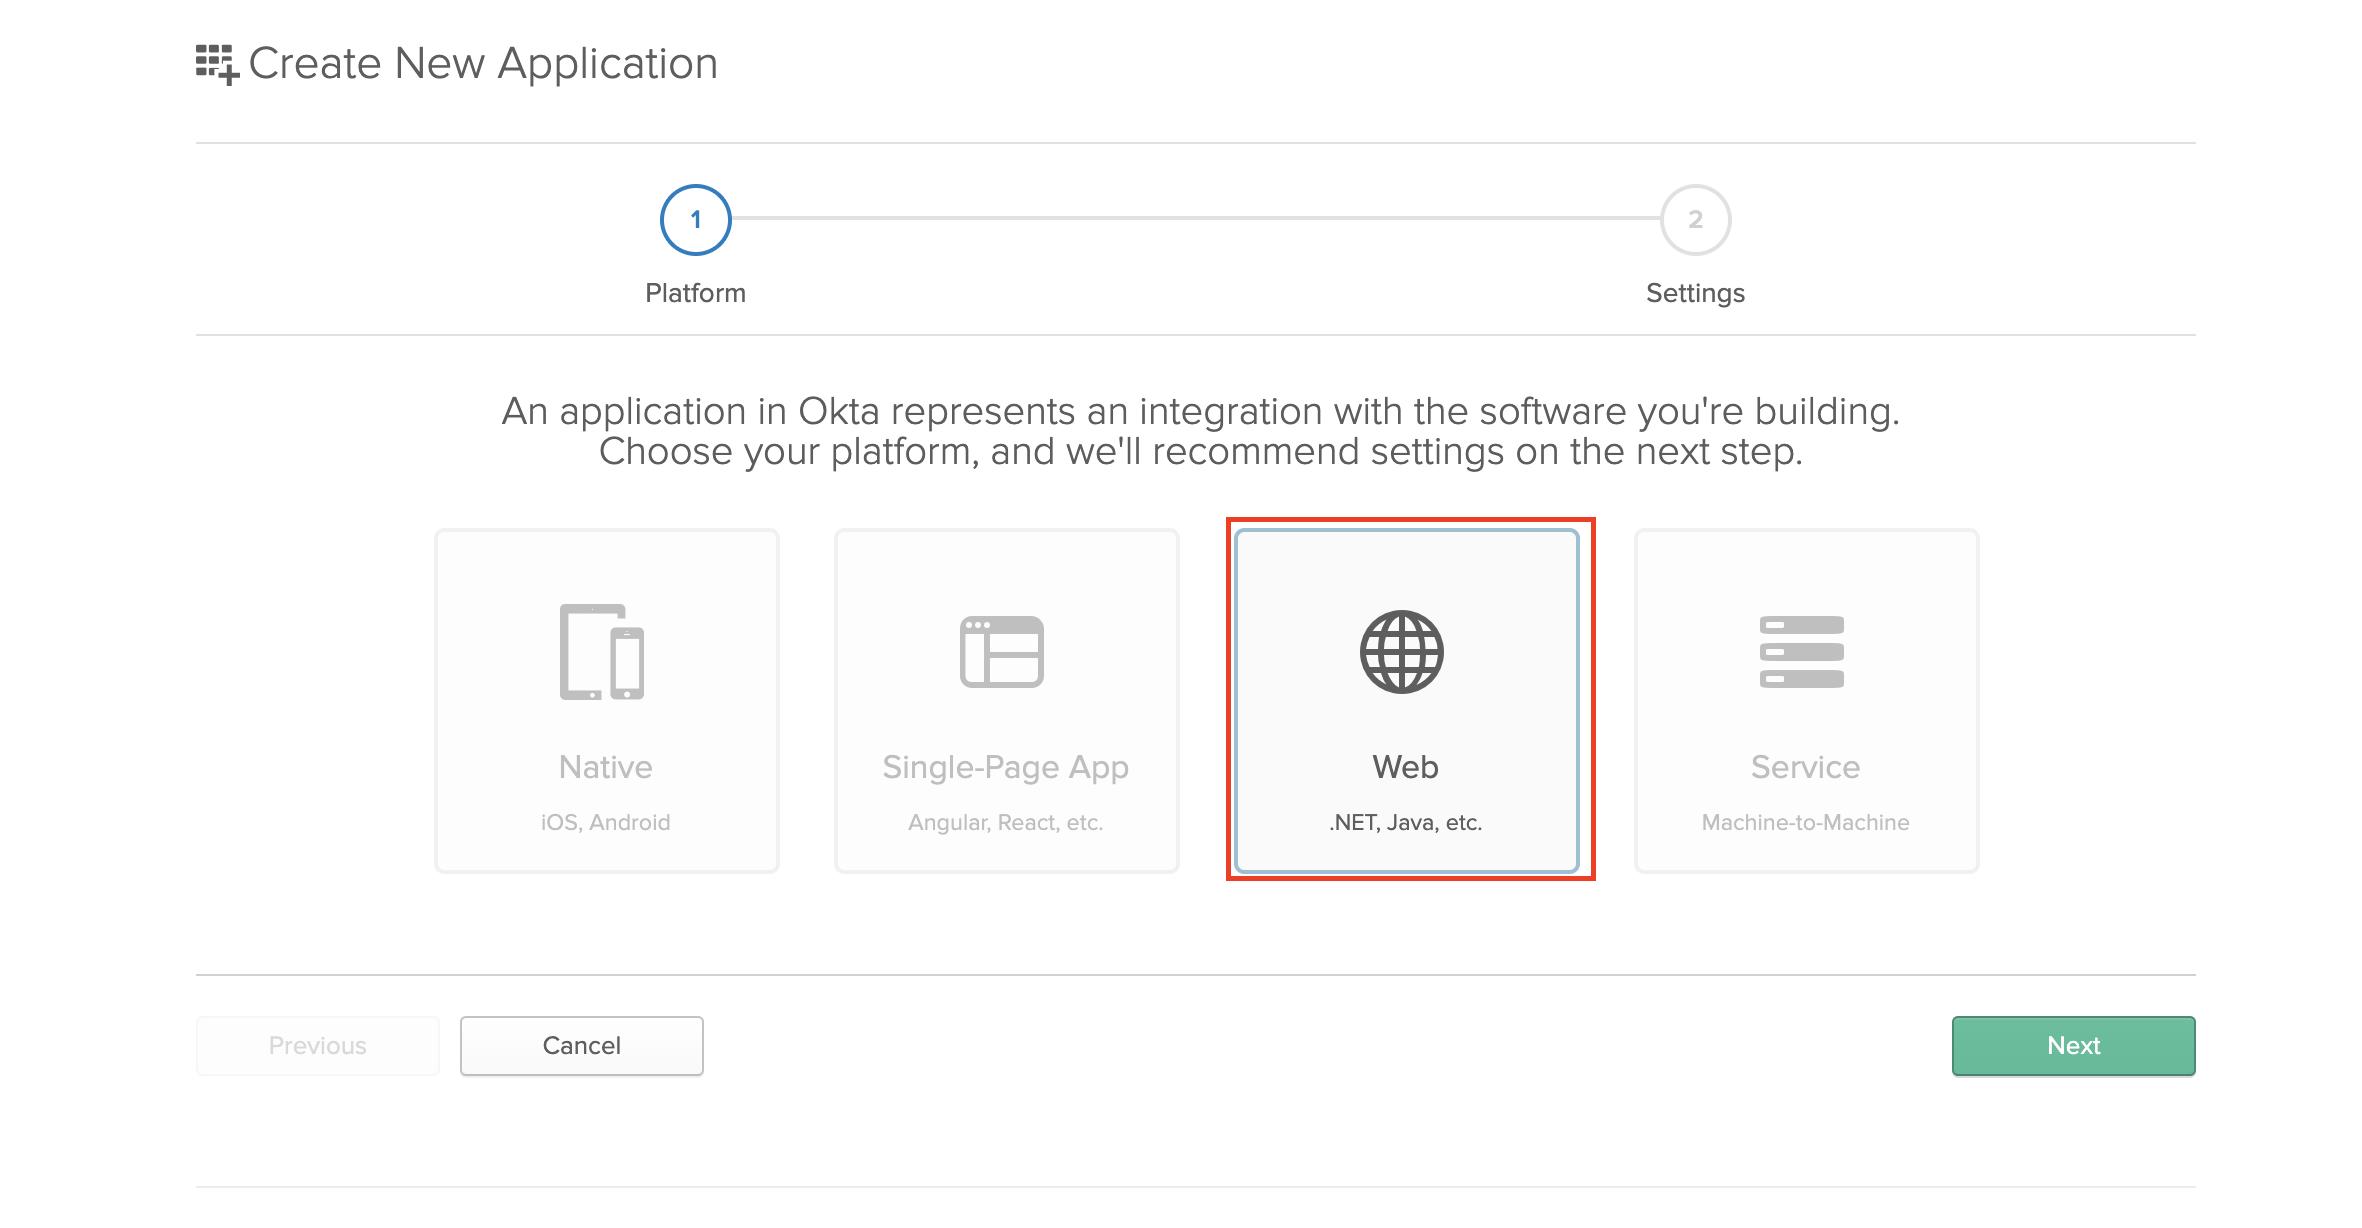 Add new web application in Okta